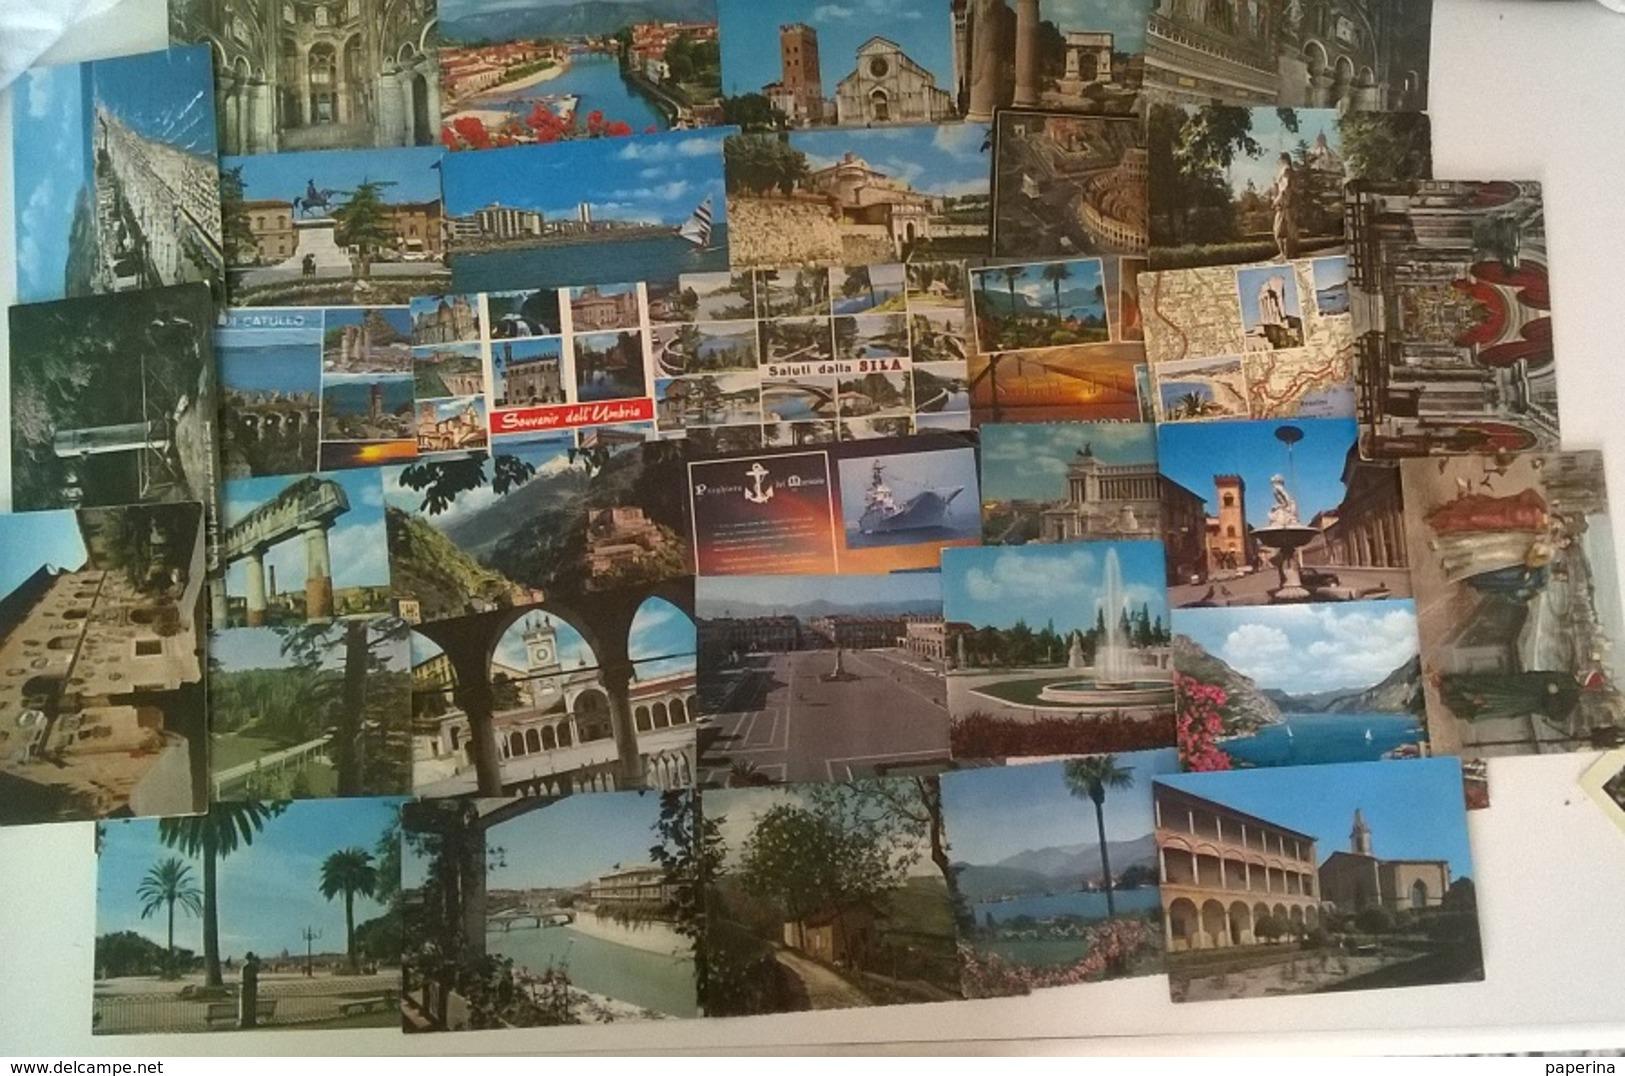 35 CARTOLINE ITALIA (4) - Cartoline